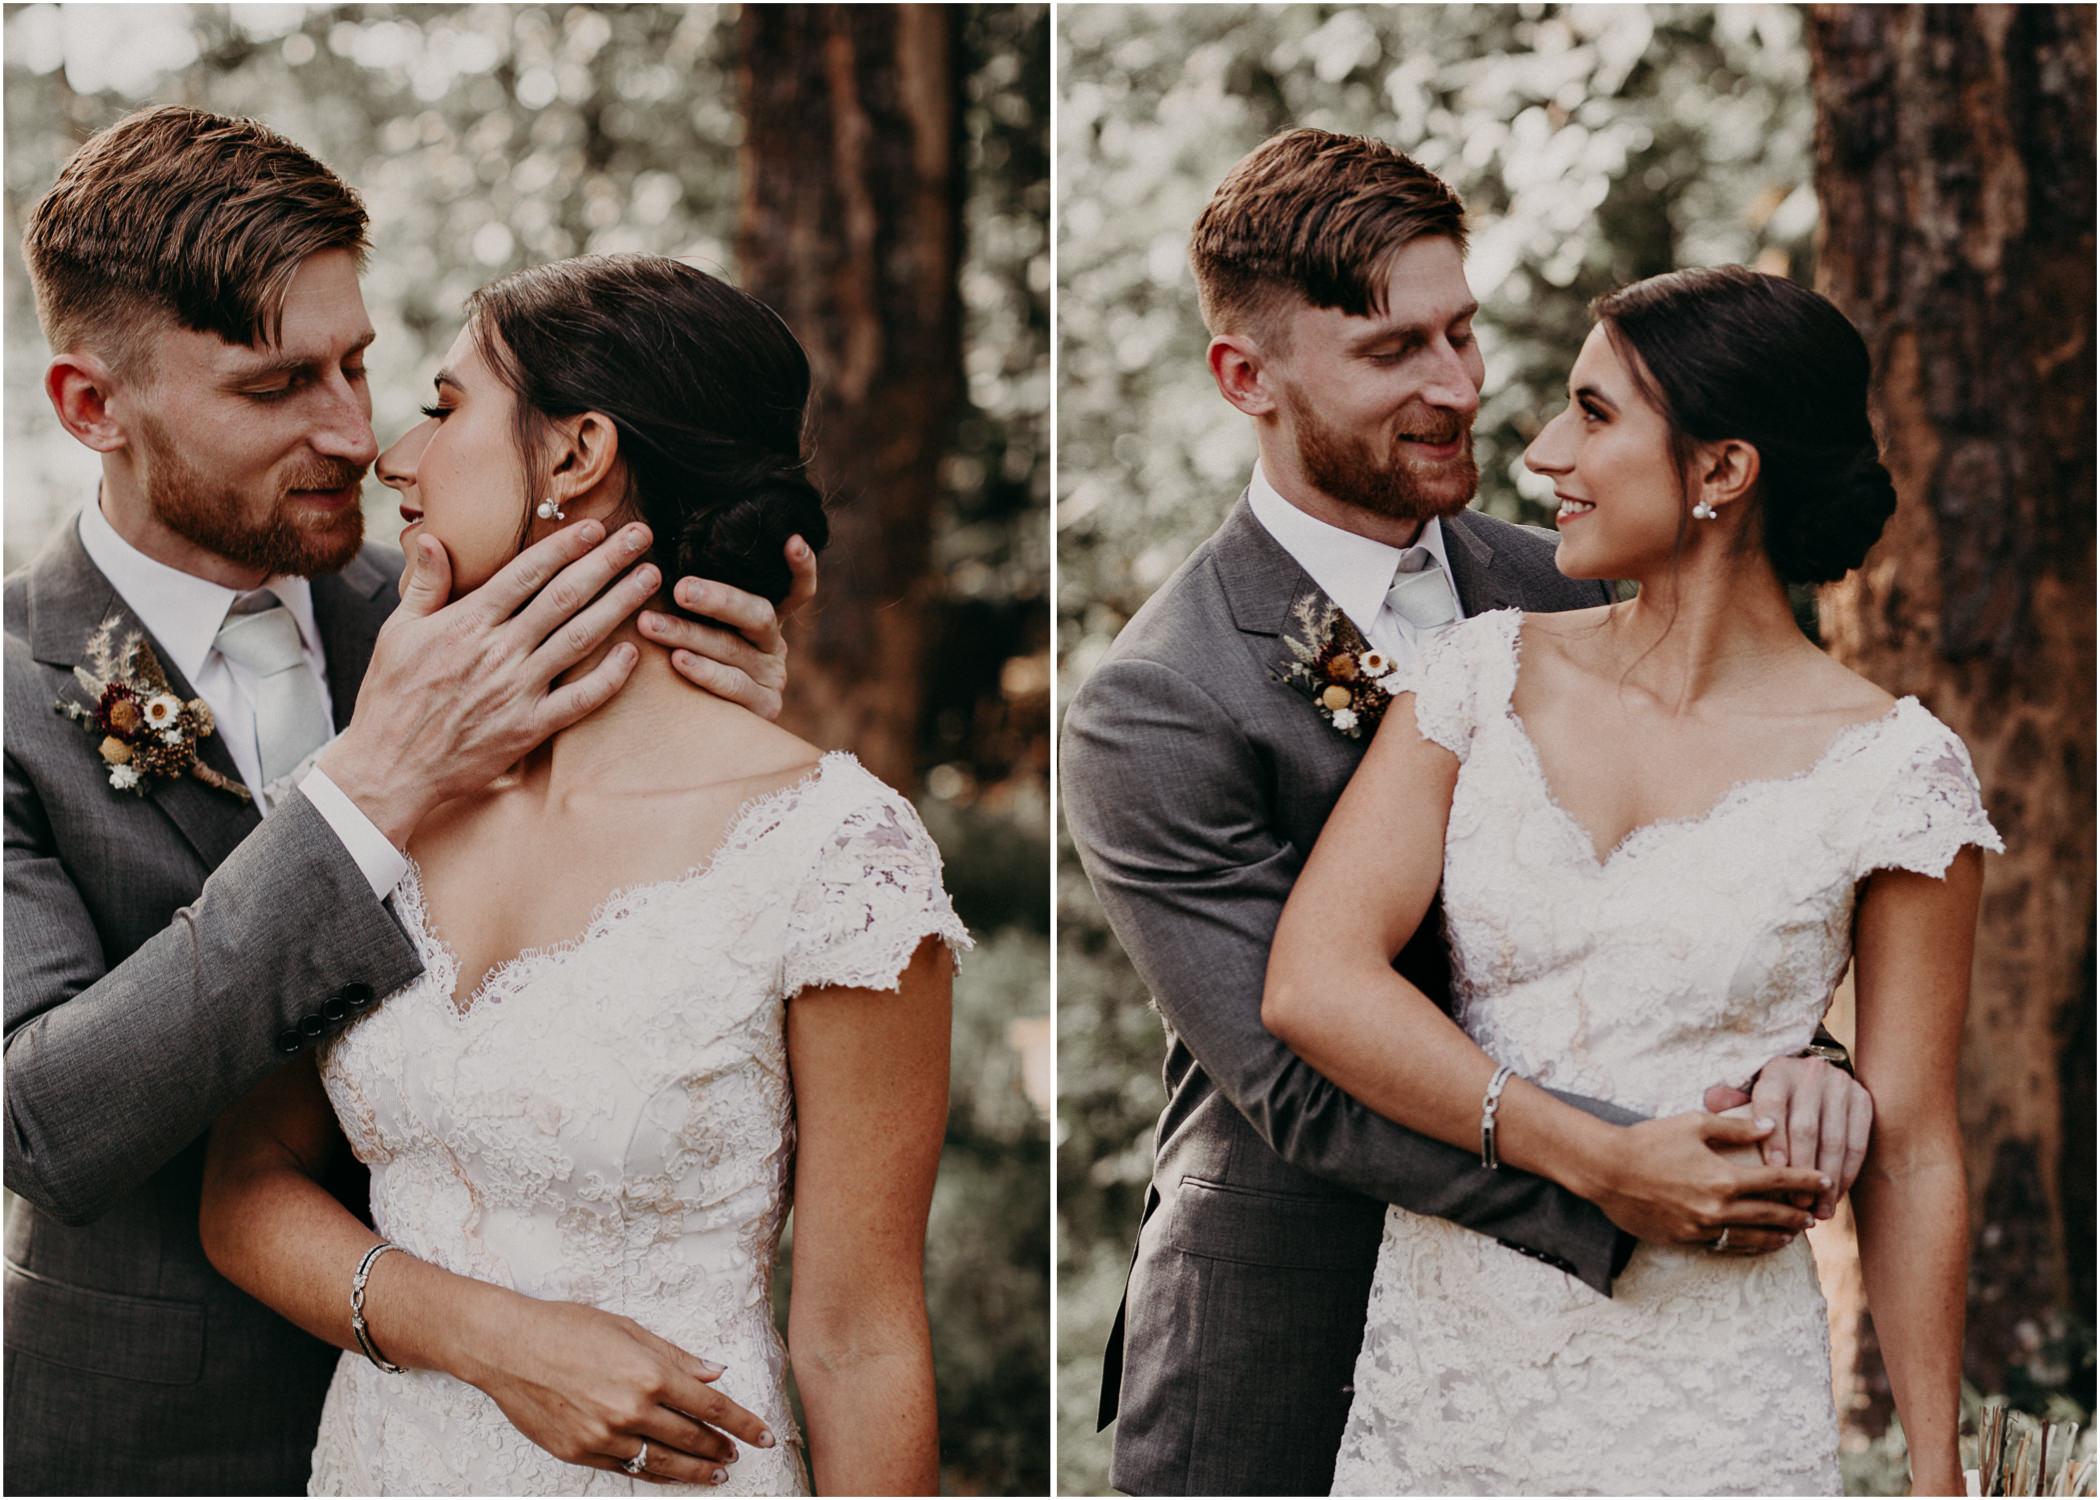 47 Bride & Groom first look before the ceremony on wedding day - Atlanta Wedding Photographer .jpg